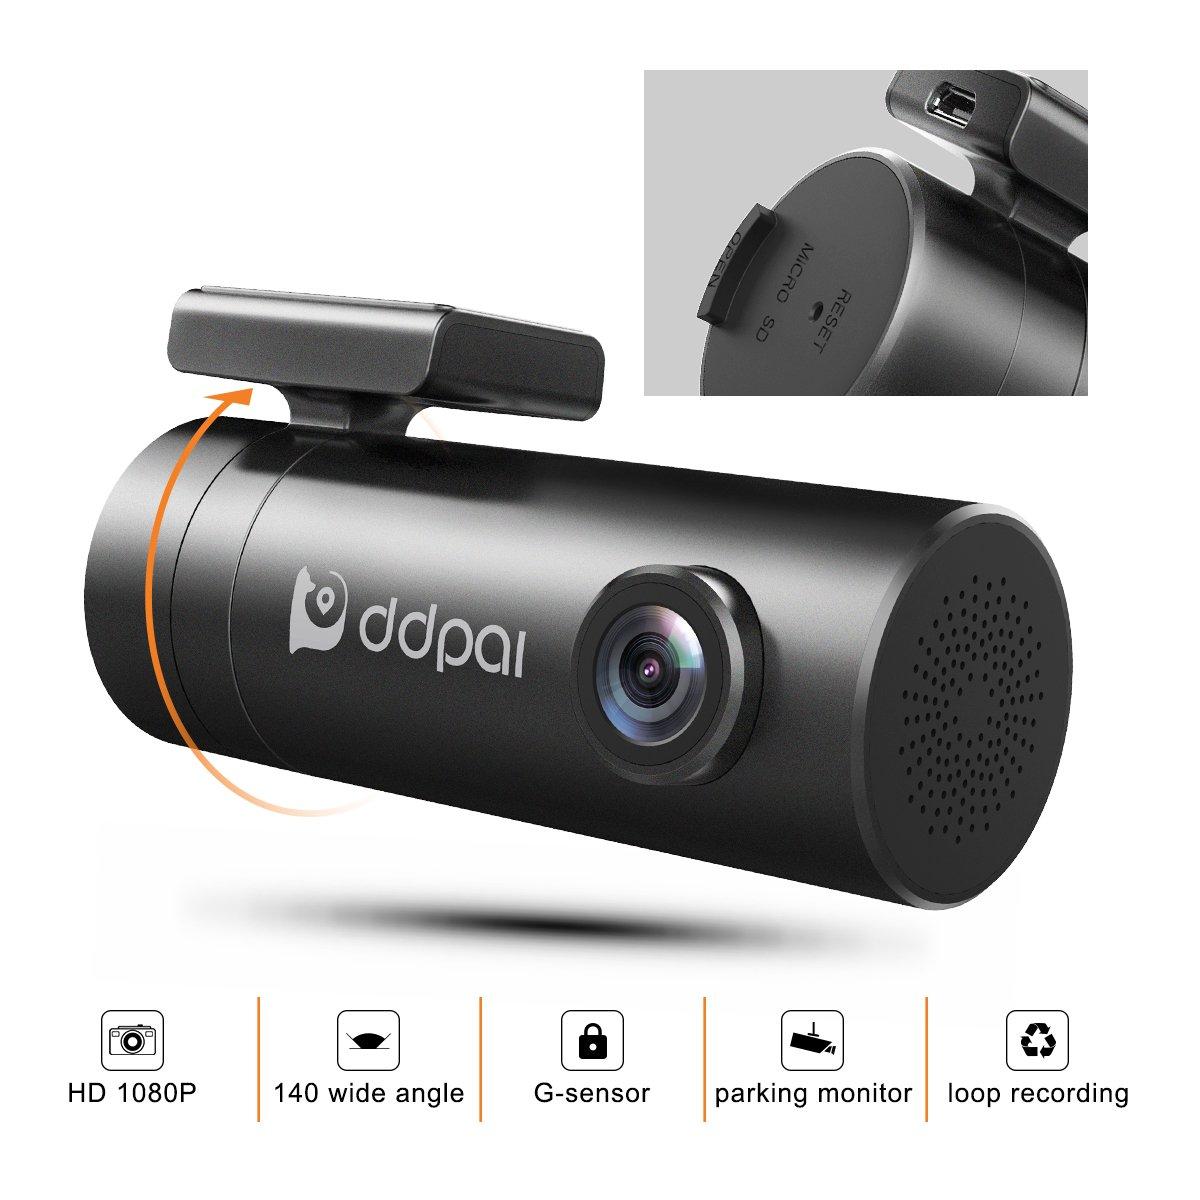 WiFi Dash Cam DDPai Mini Pro Car Camera - 1080P HD Dashboard Camera F1.8 Aperture WDR for Better Night Driving Recorder 4-Lane Wide-Angle Lens G-Sensor Loop Recording Sony Sensor